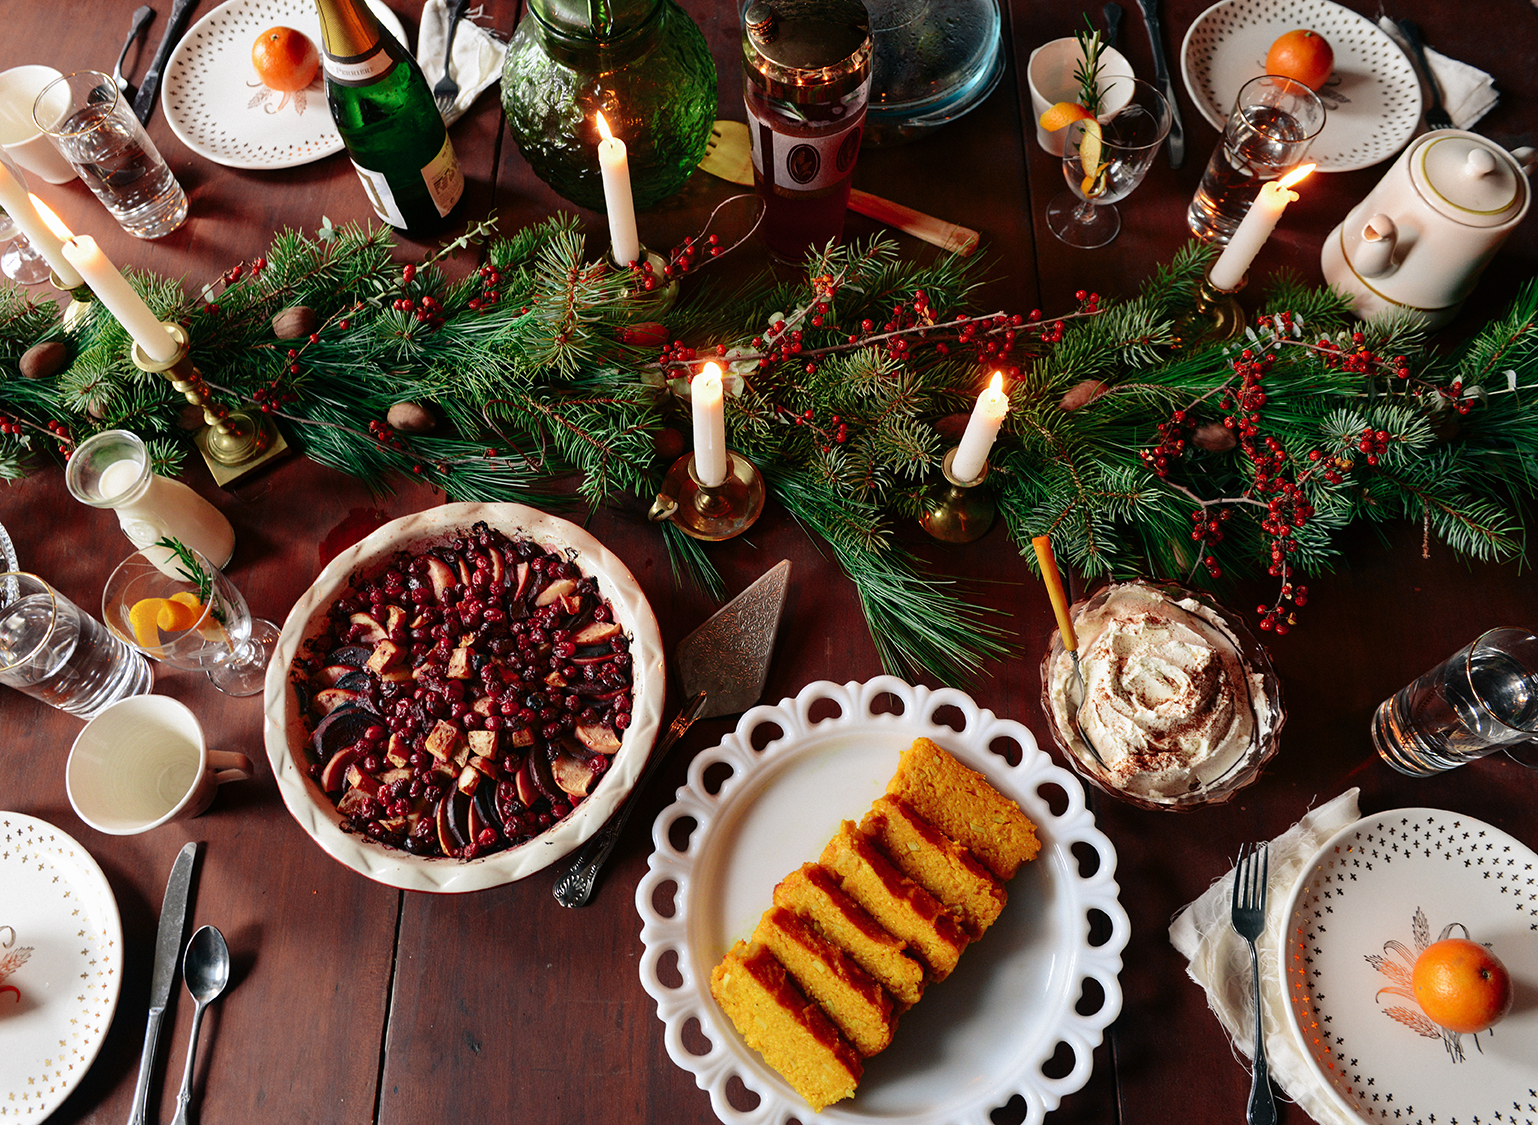 Butternut Squash Polenta w/ Stewed Fruit & Whipped Mascarpone for a Wintry Brunch // www.WithTheGrains.com